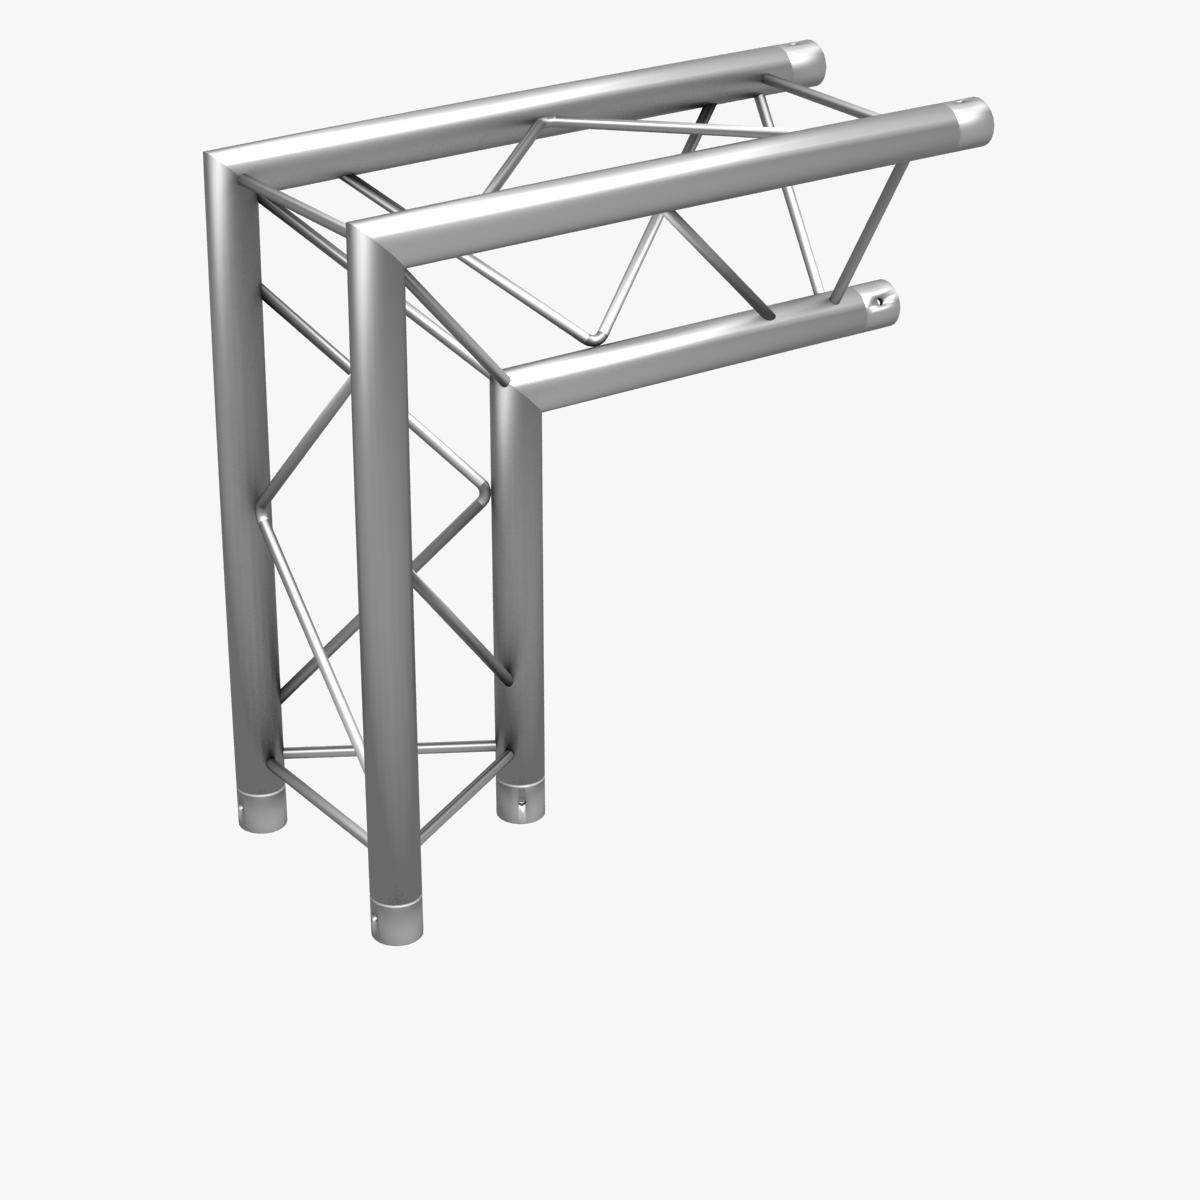 triangular trusses (collection 55 modular pieces) 3d model 3ds max dxf fbx c4d dae texture obj 216263